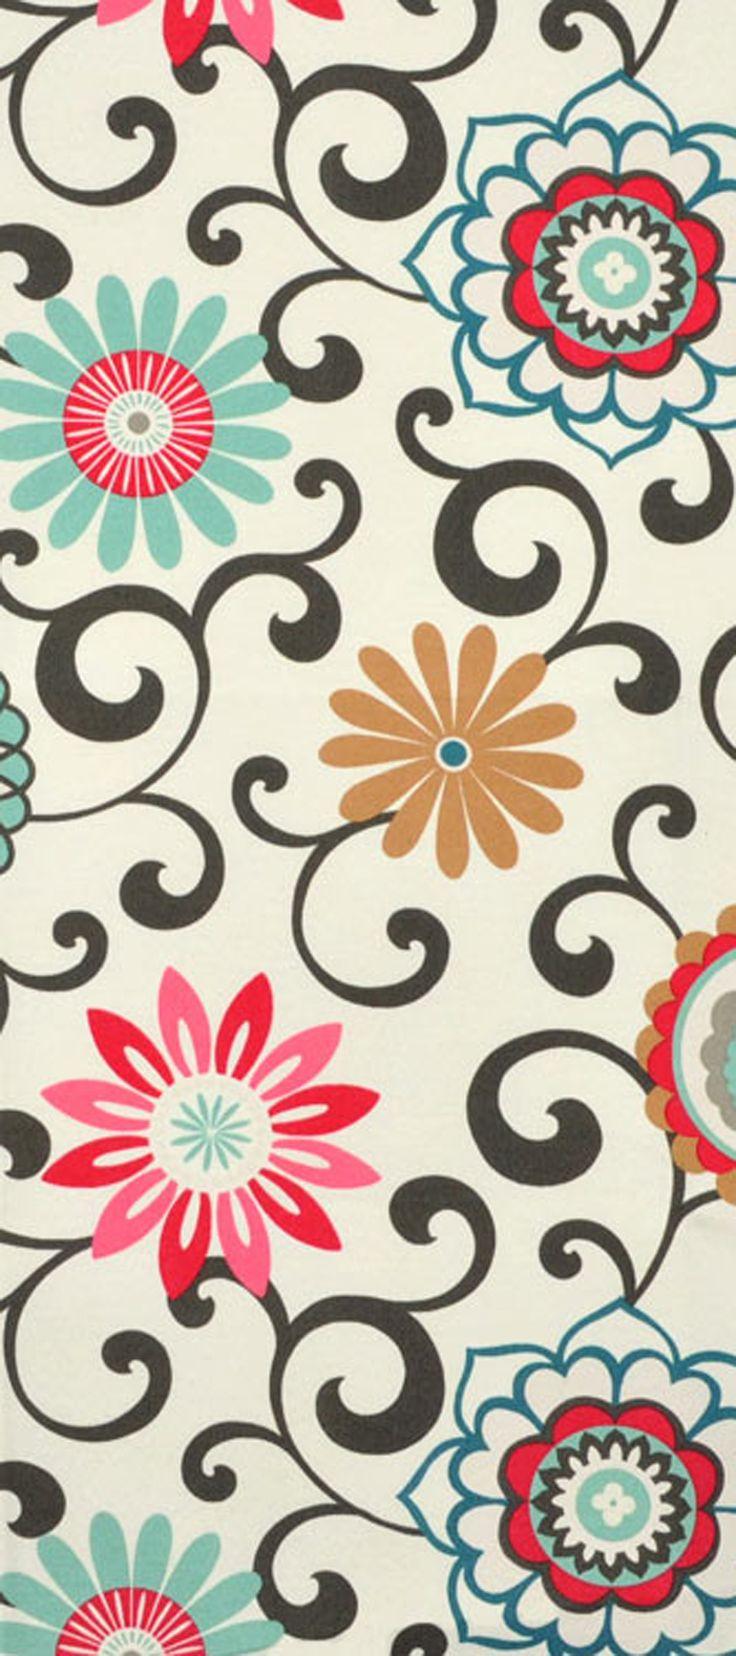 Discount outdoor fabric by the yard - Waverly Pom Pom Play Sun N Shade Peachtini Fabric